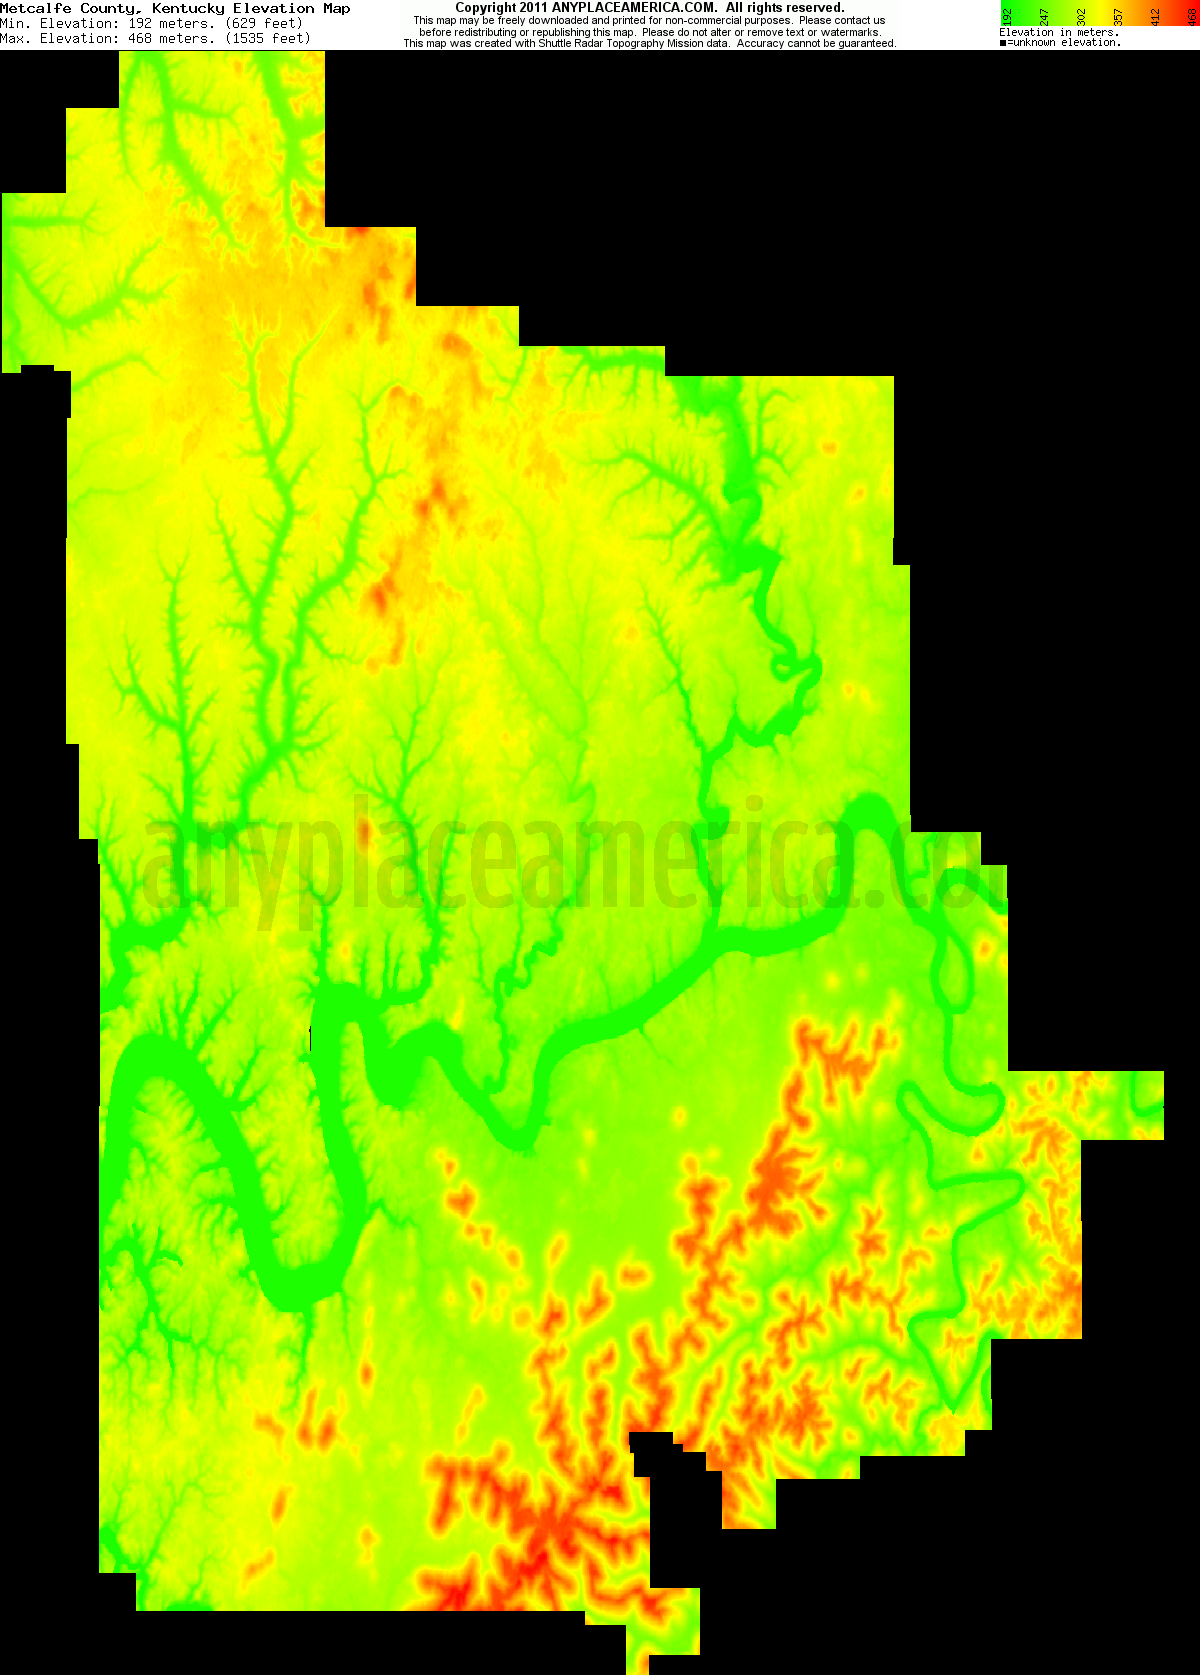 Metcalfe, Kentucky elevation map